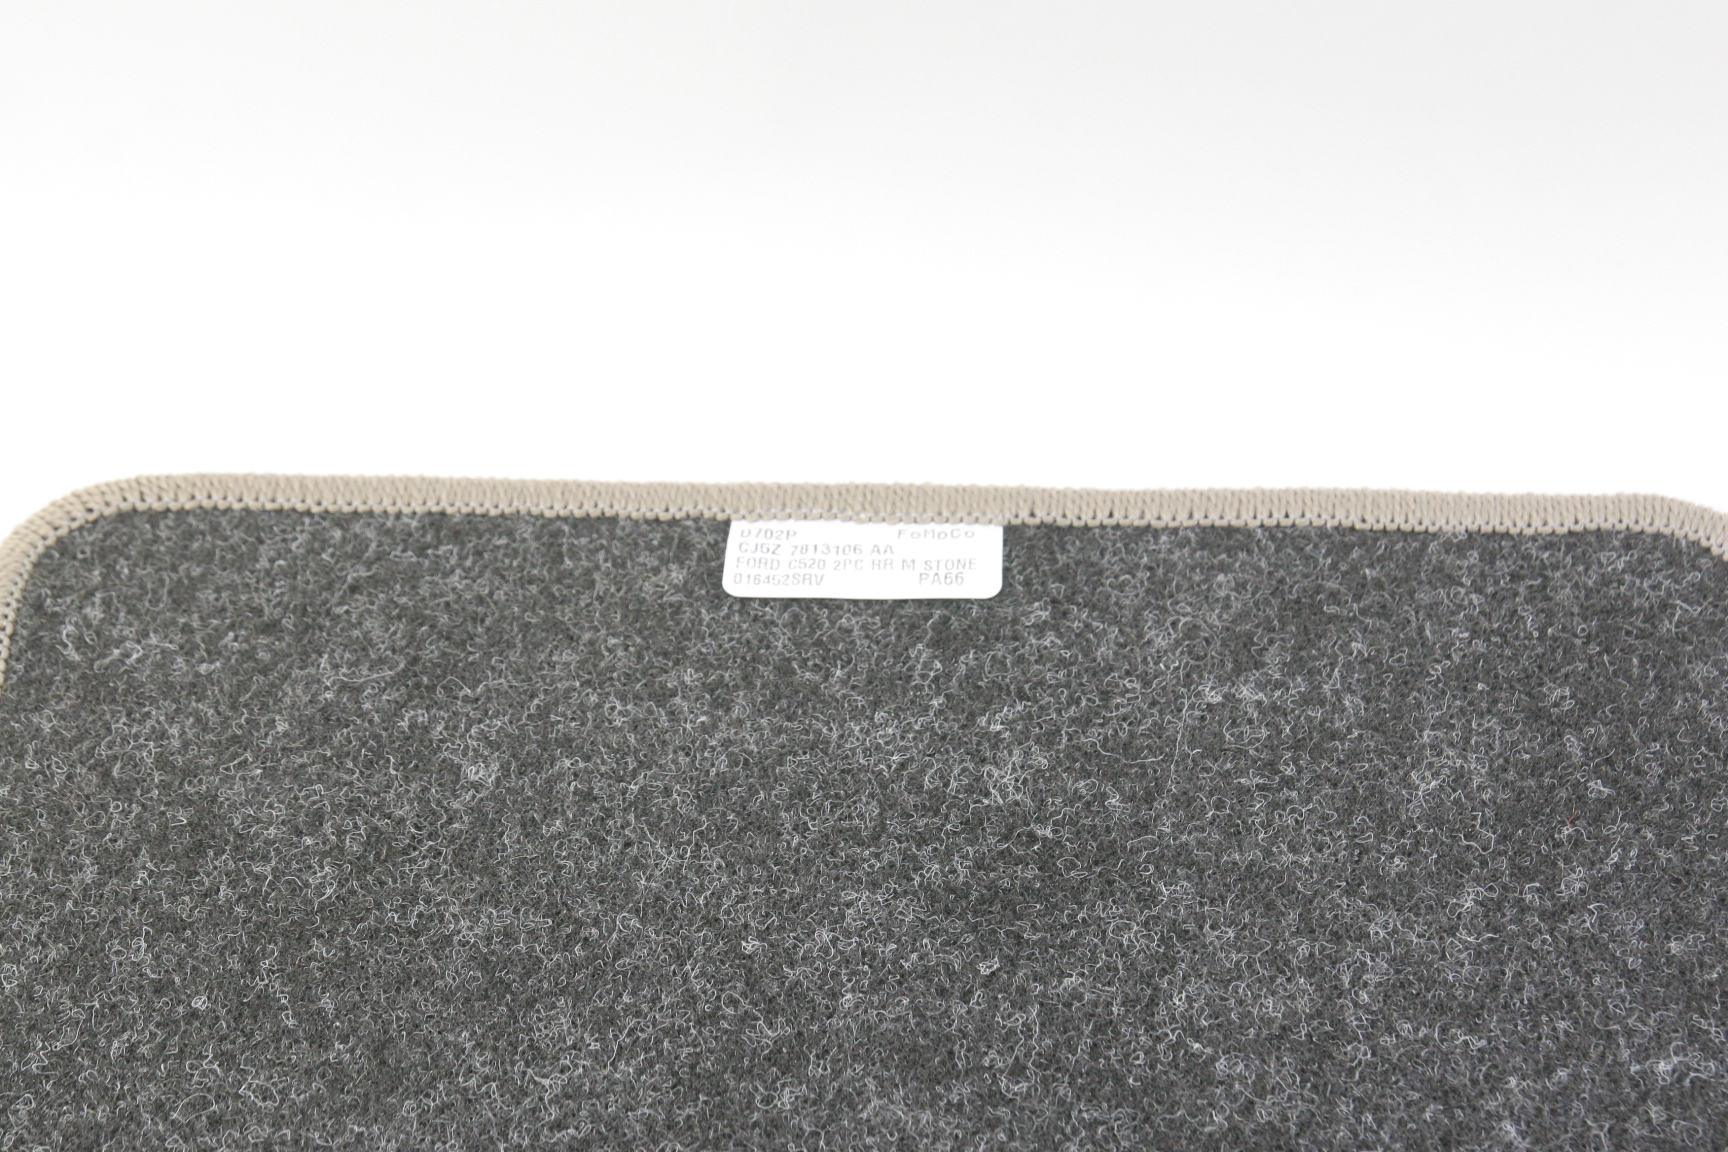 ***~ New OEM Ford CJ5Z7813106AA 13-16 Escape Carpet Rear Mats Medium Light Stone - image 5